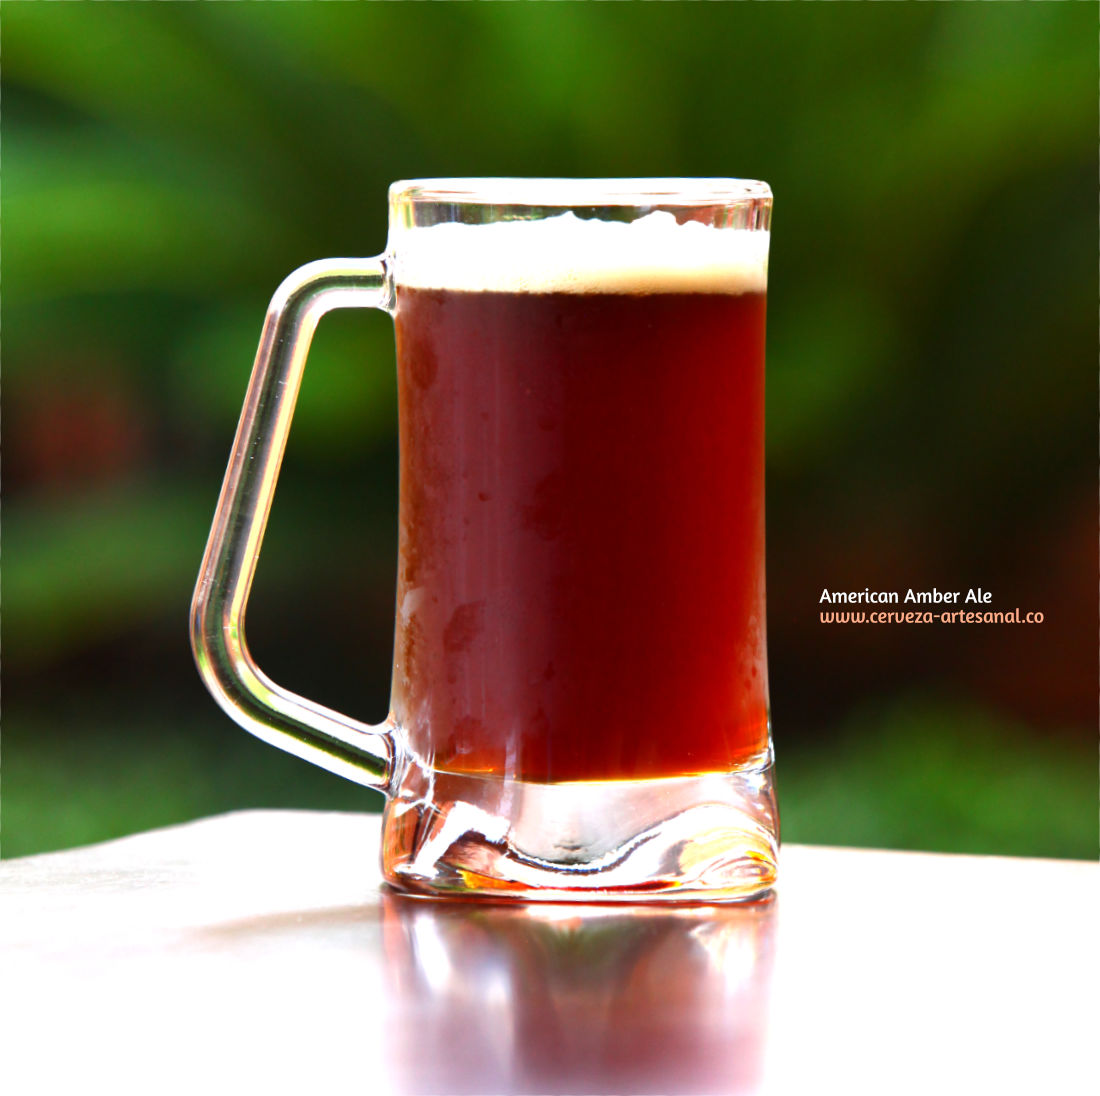 American Amber Ale fermentada con levadura kveik